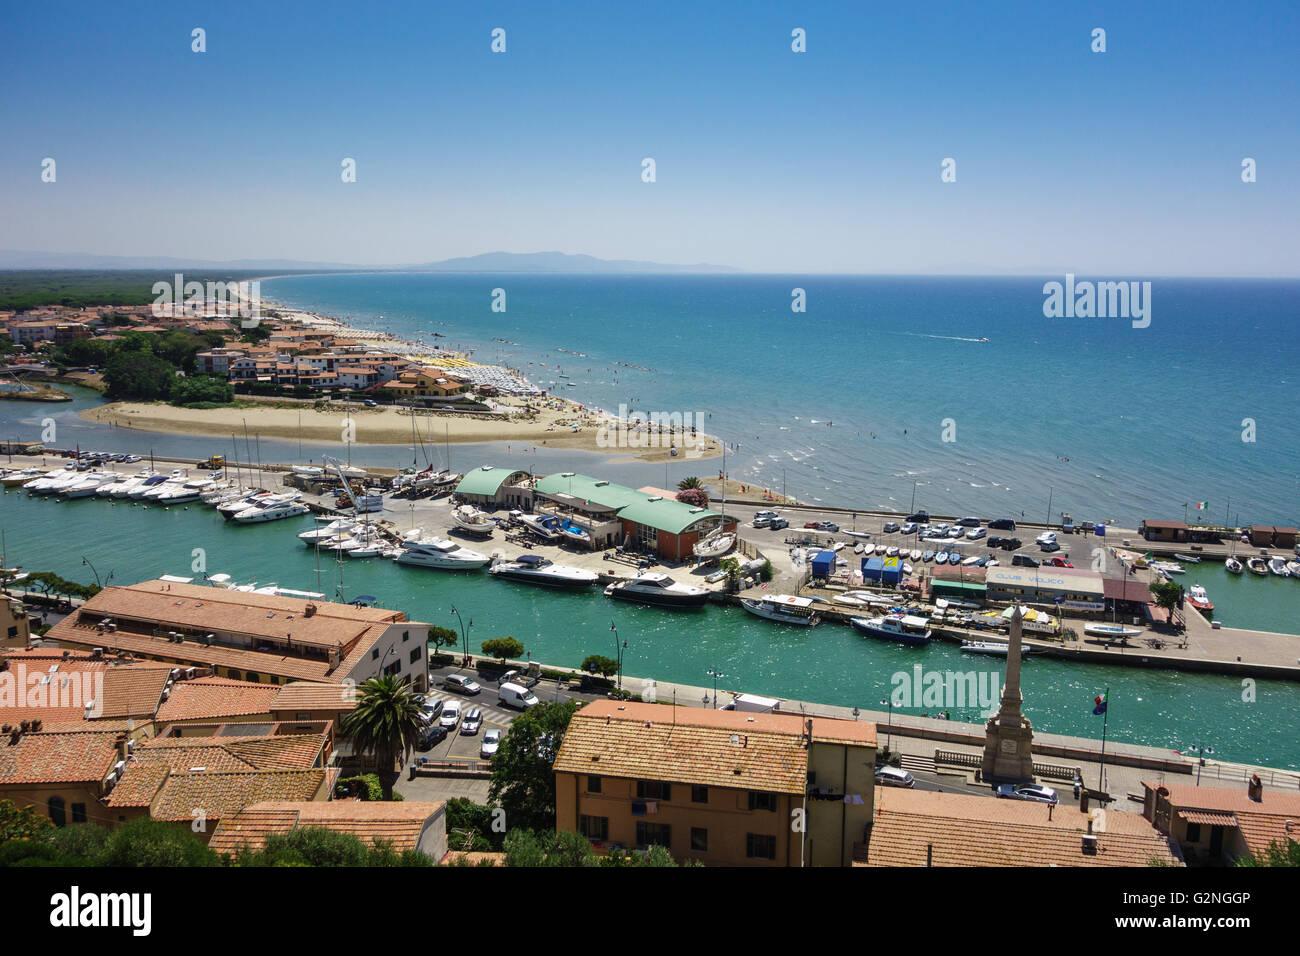 View from the Castello of the seaside town of Castiglione della Pescaia in the province of Grosseto, Tuscany Italy. Stock Photo